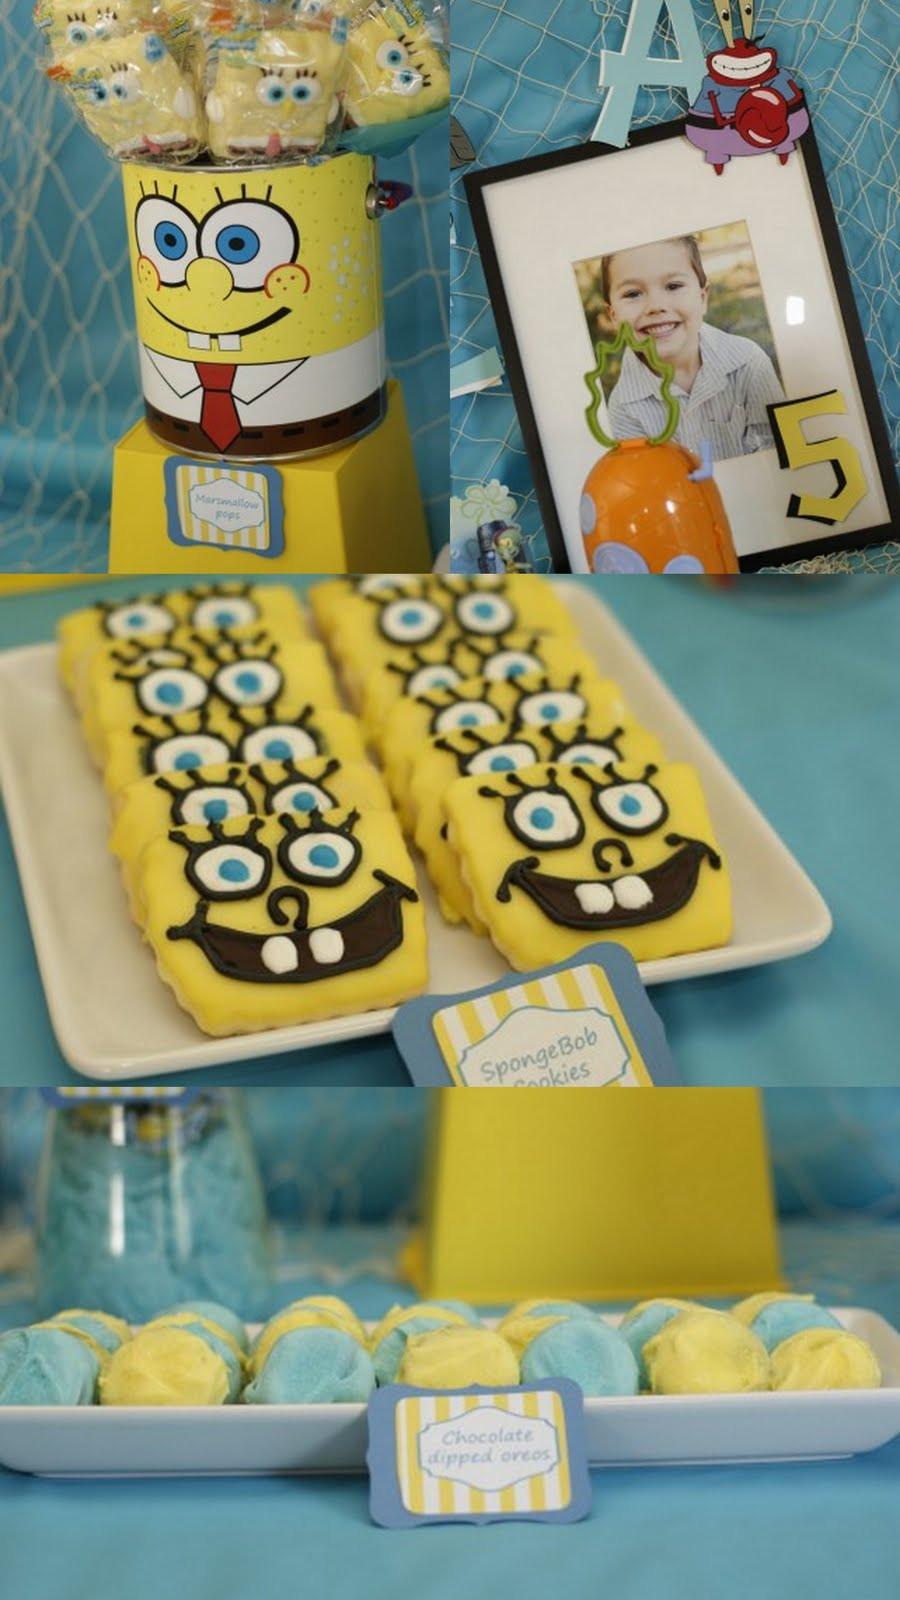 Best ideas about Spongebob Birthday Decorations . Save or Pin Corn & pany SpongeBob Birthday Now.